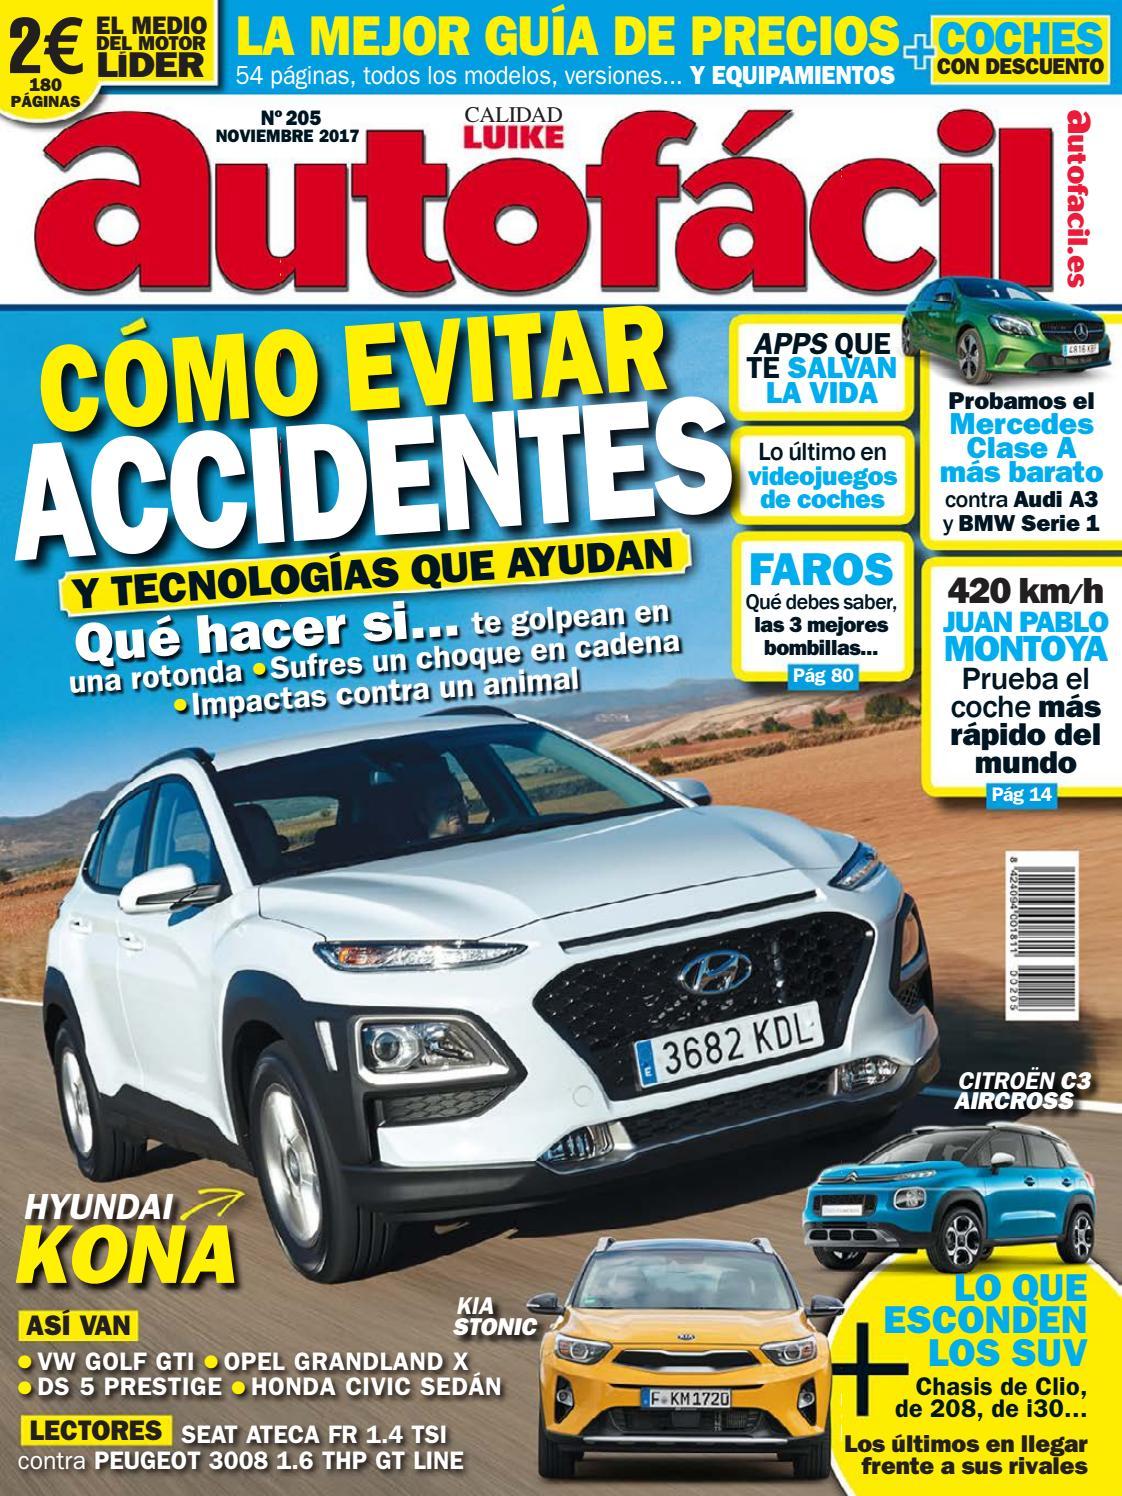 Autofácil Nº 205. Noviembre 2017 by LIDER - issuu